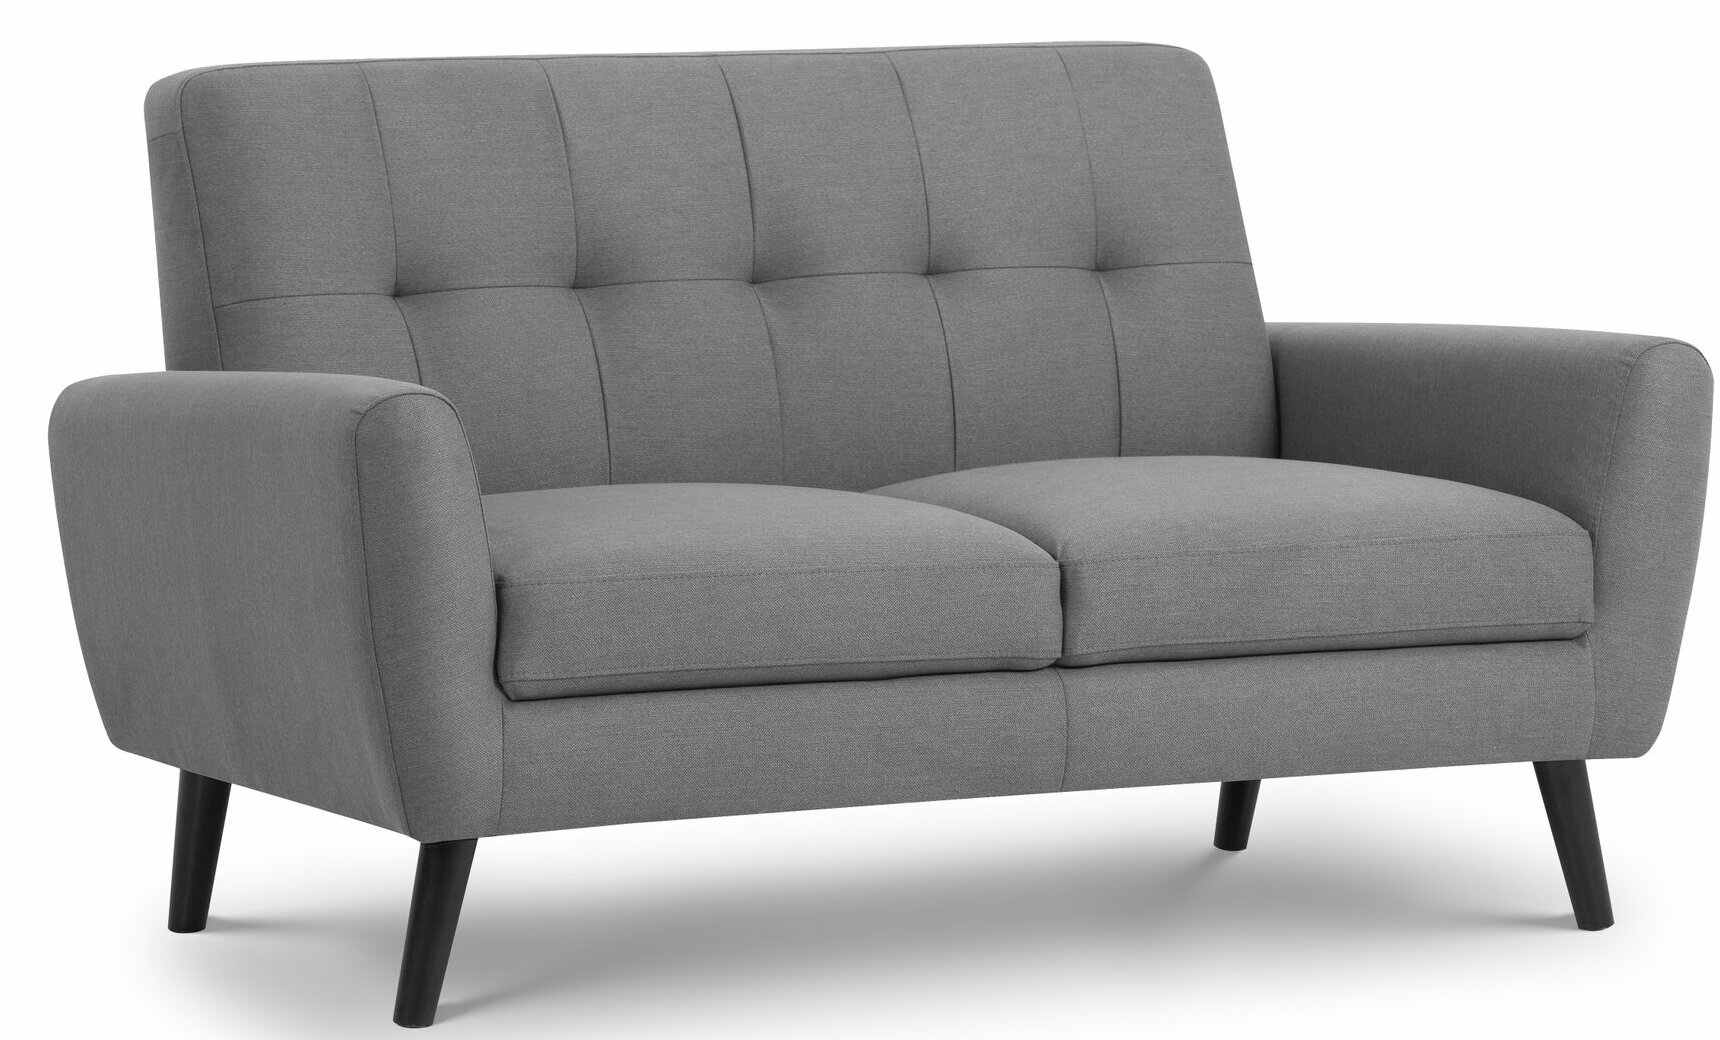 Swell Delphinus 2 Seater Loveseat Download Free Architecture Designs Grimeyleaguecom